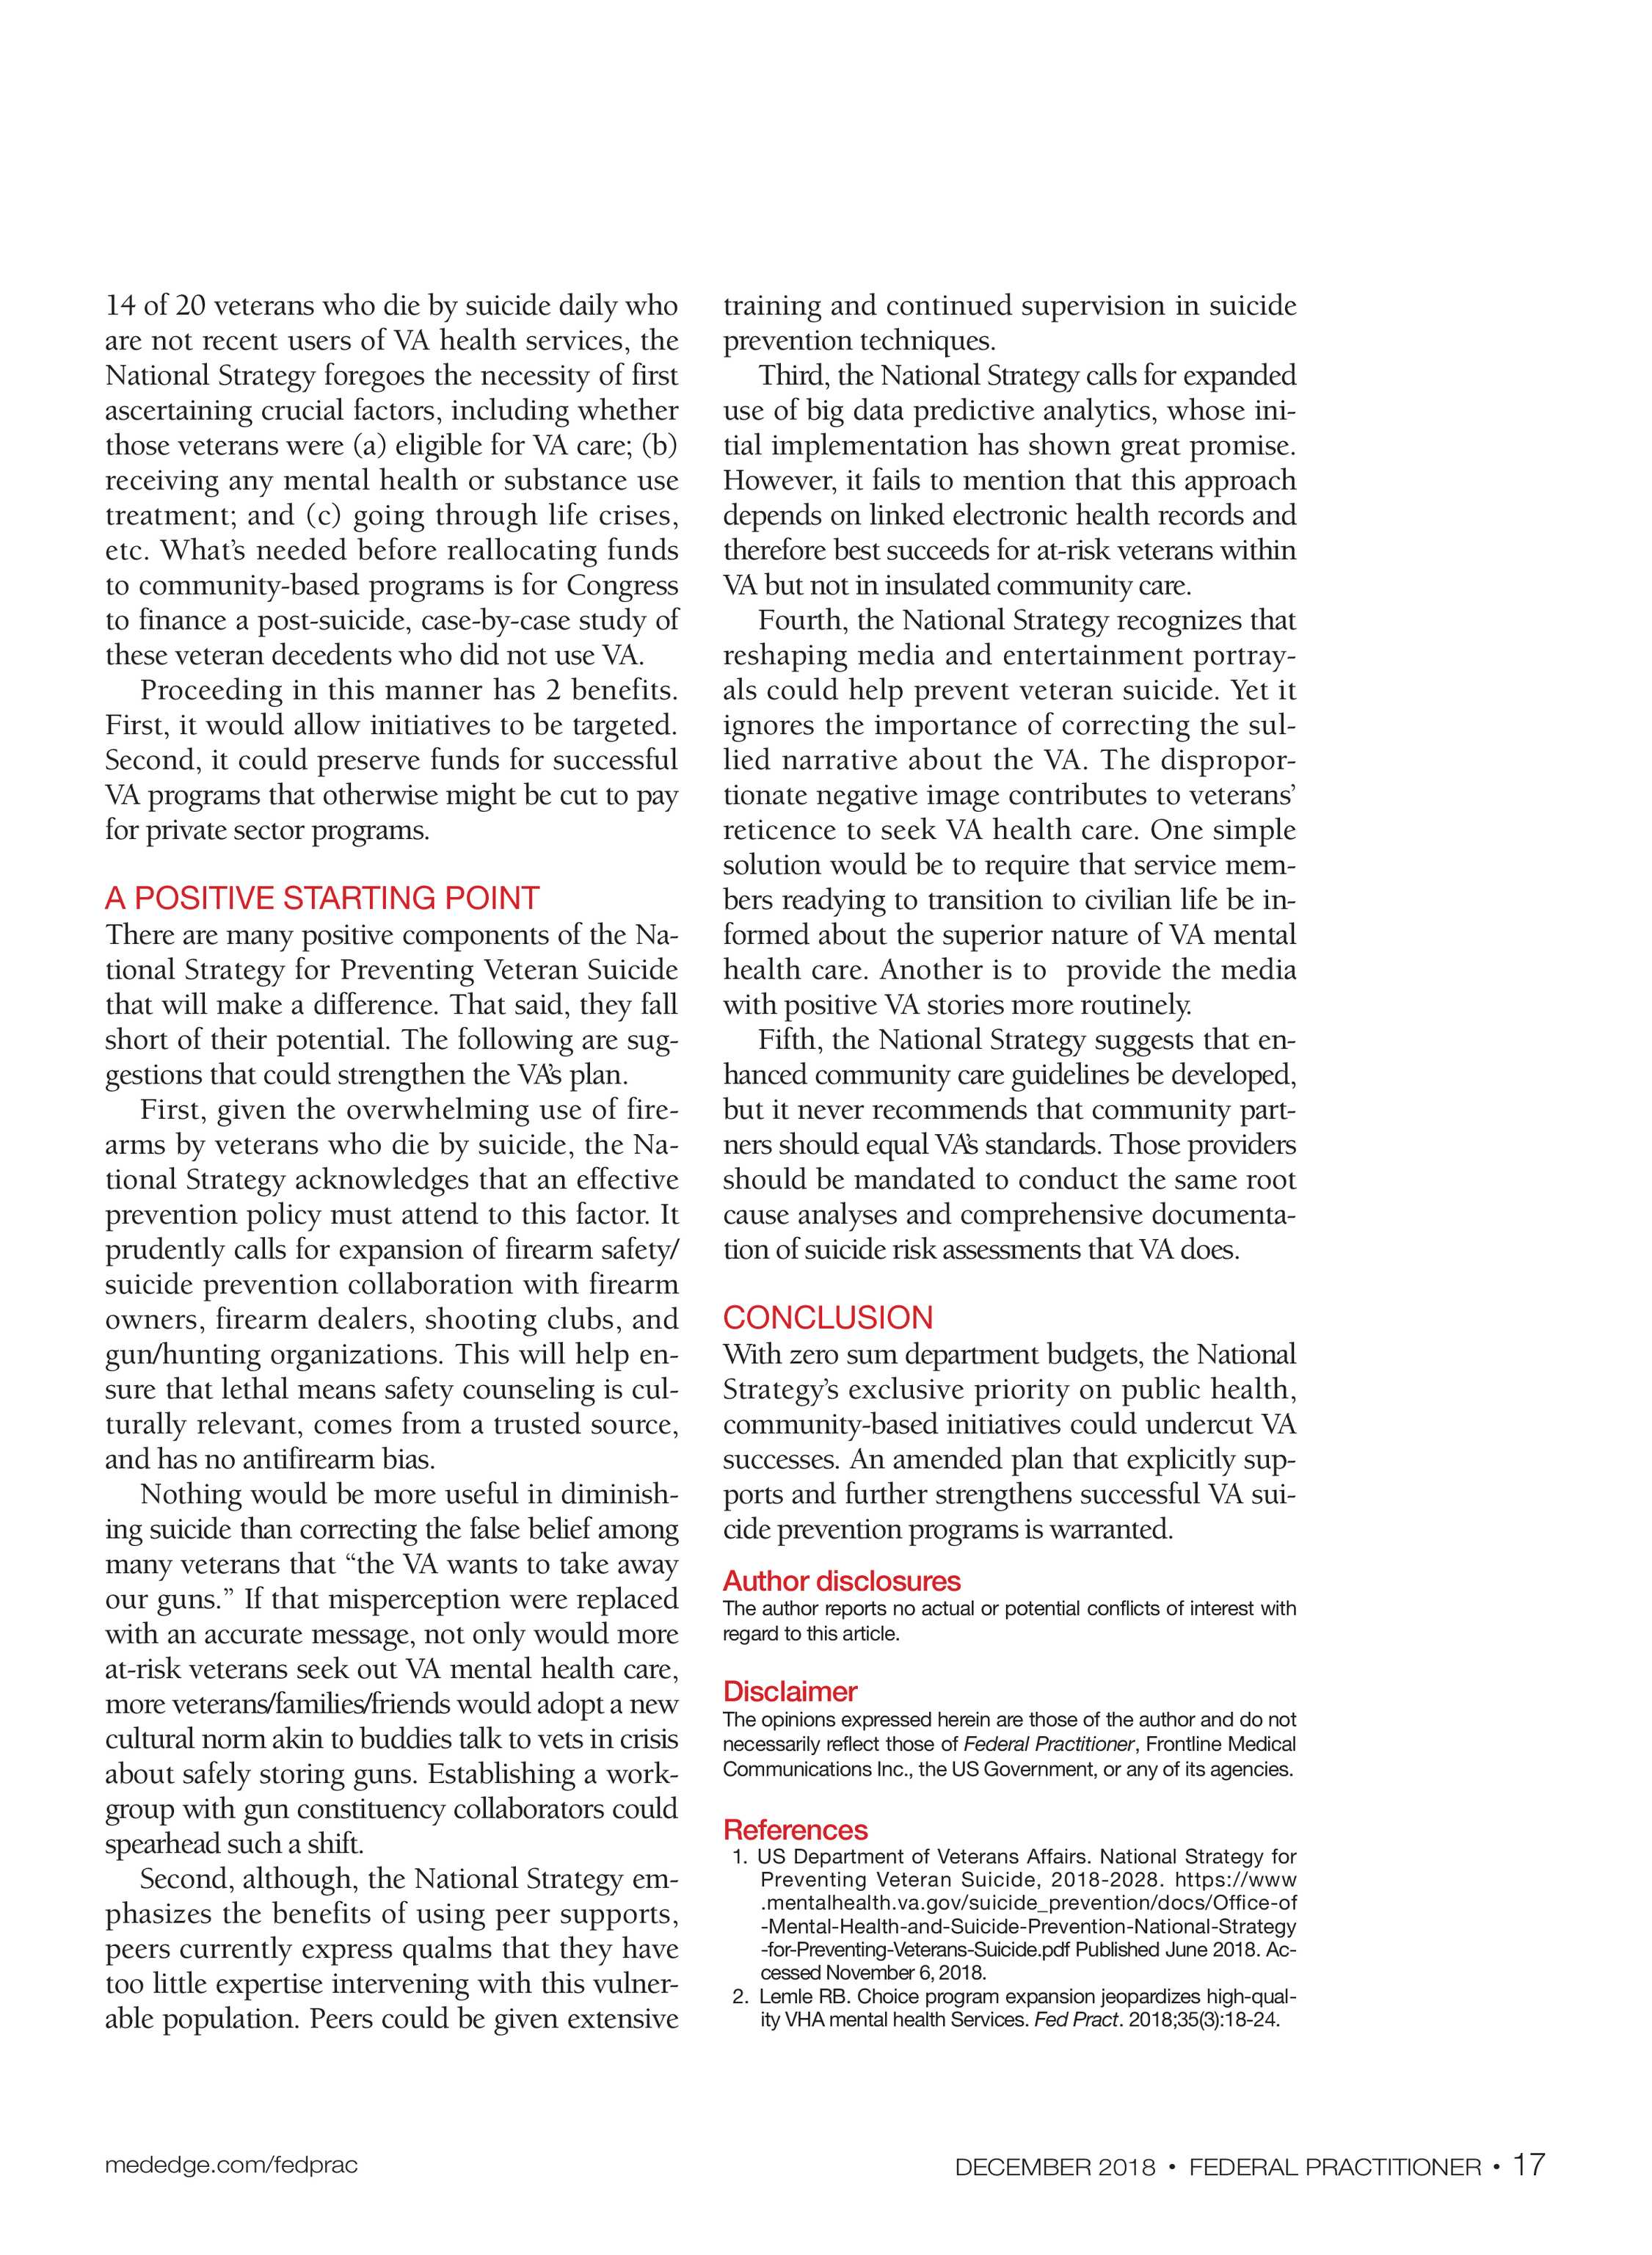 Federal Practitioner - December 2018 - page 22